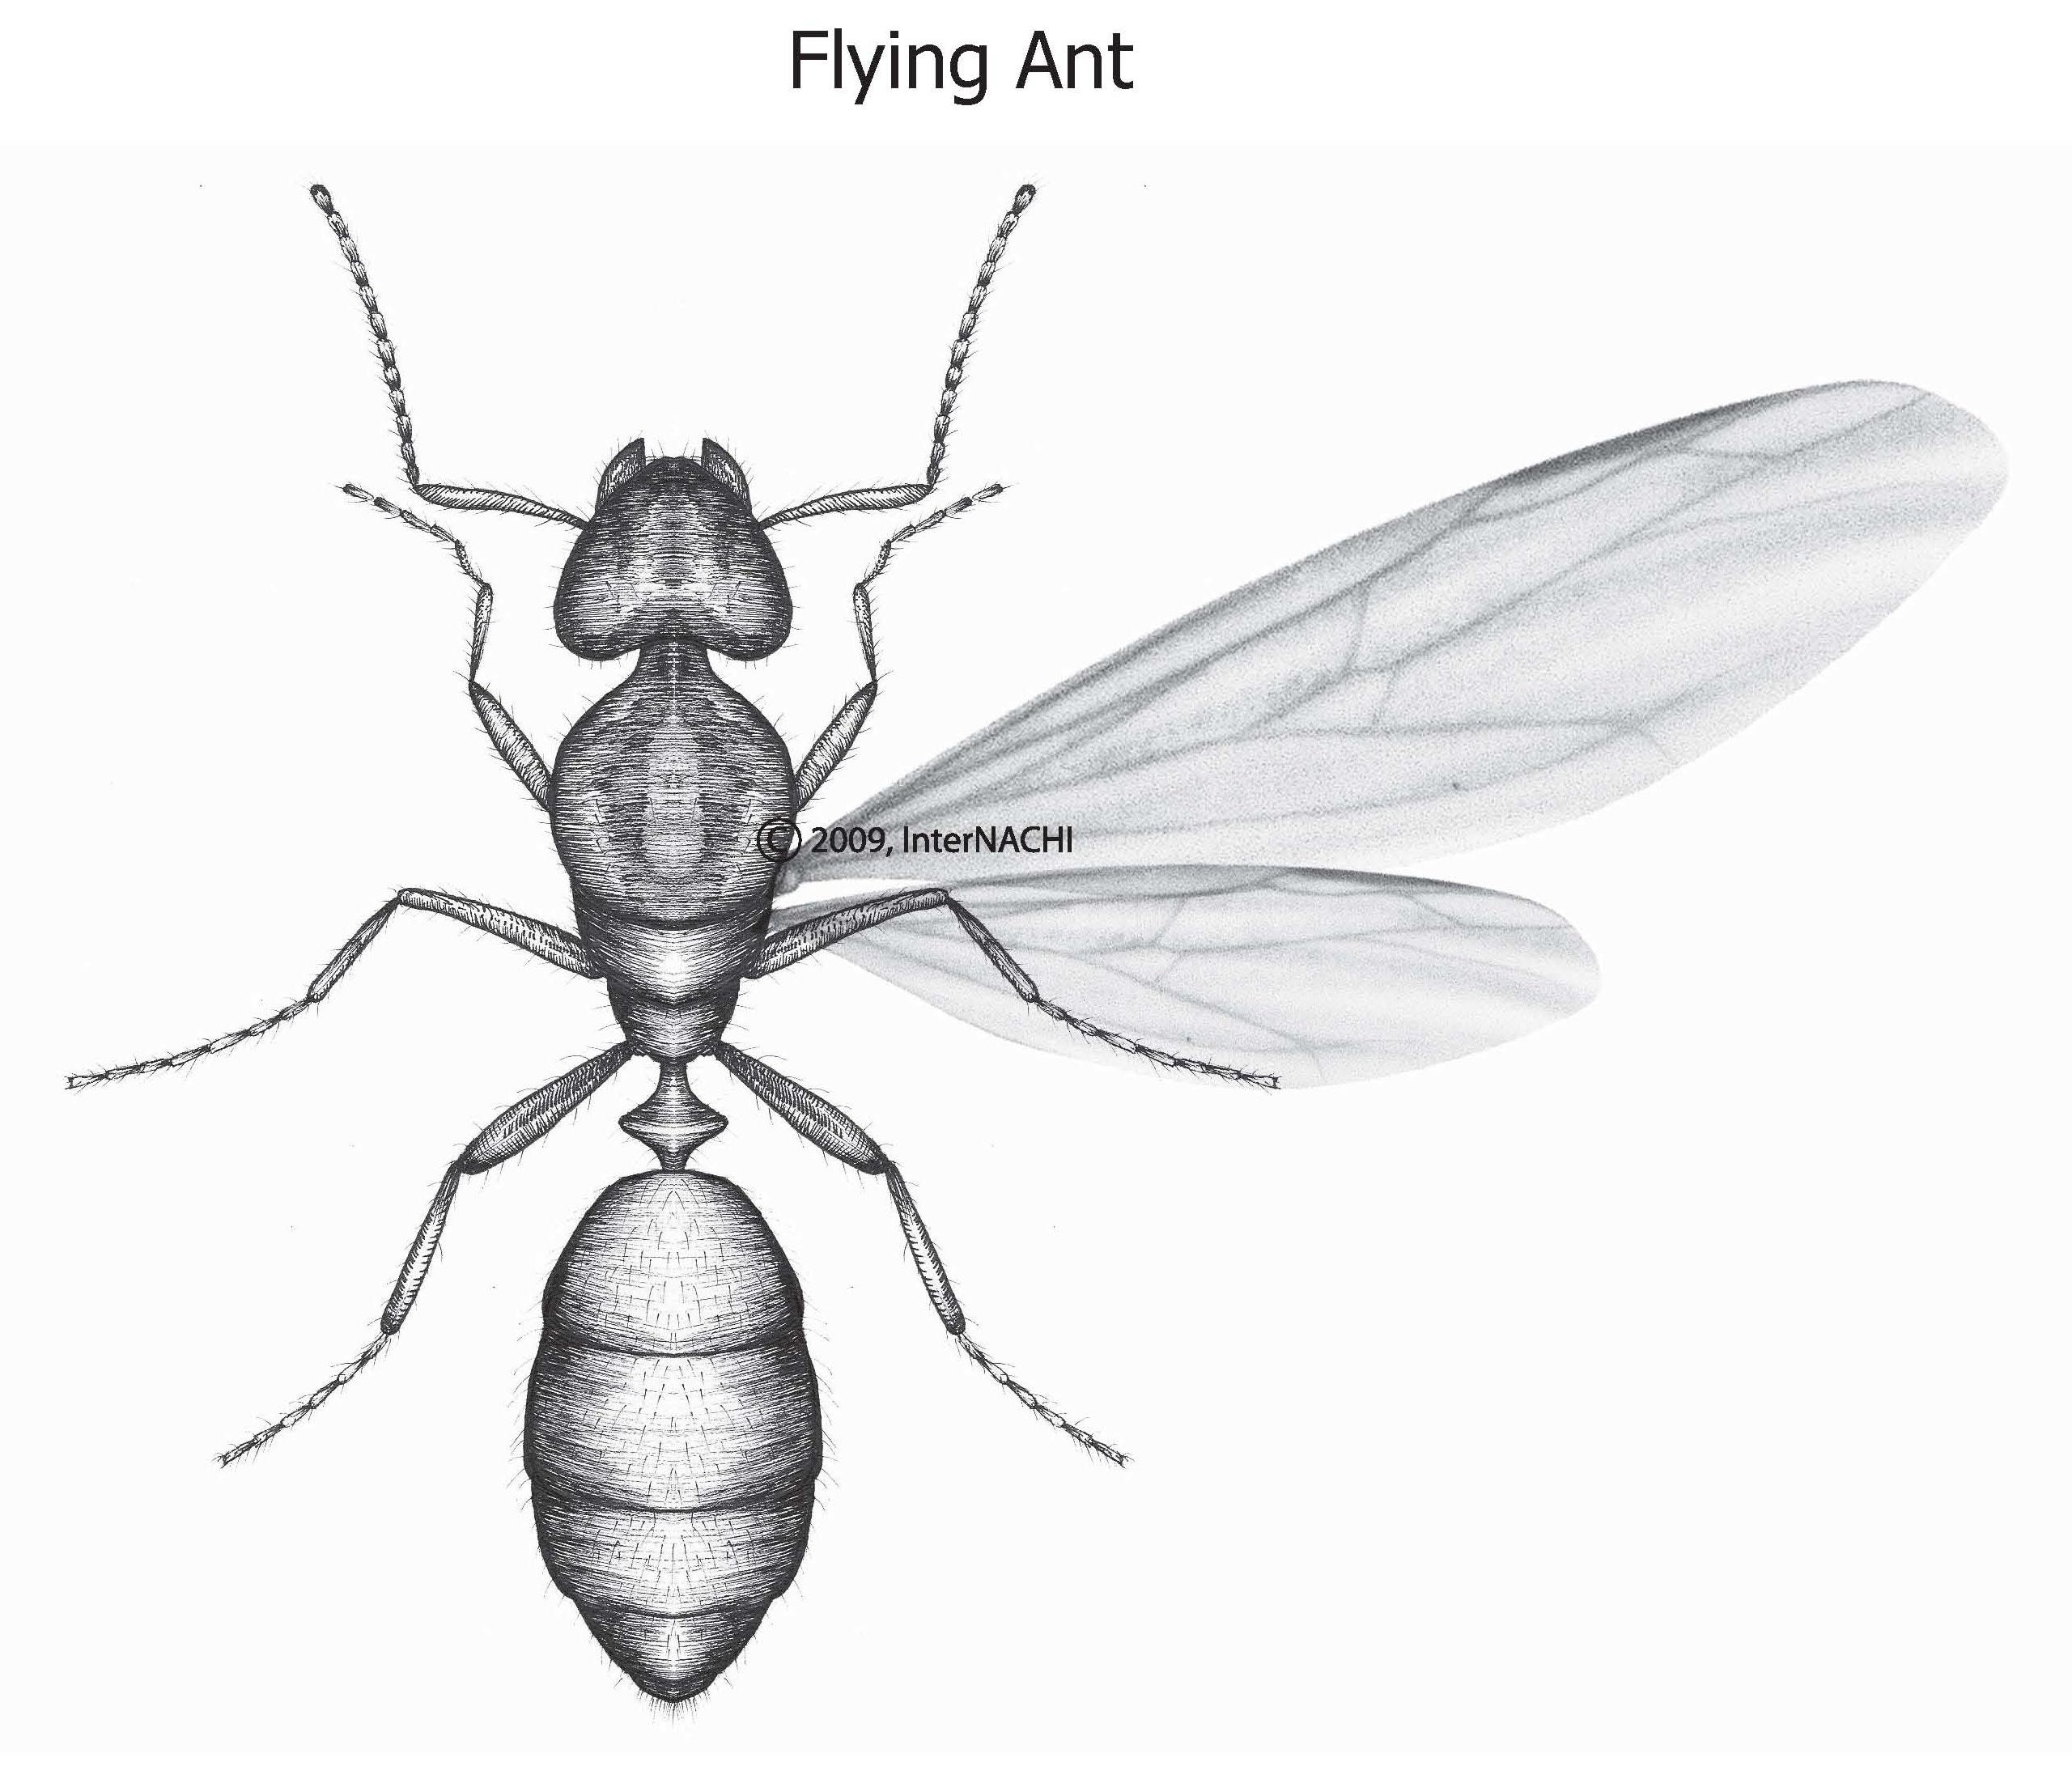 Flying ant.